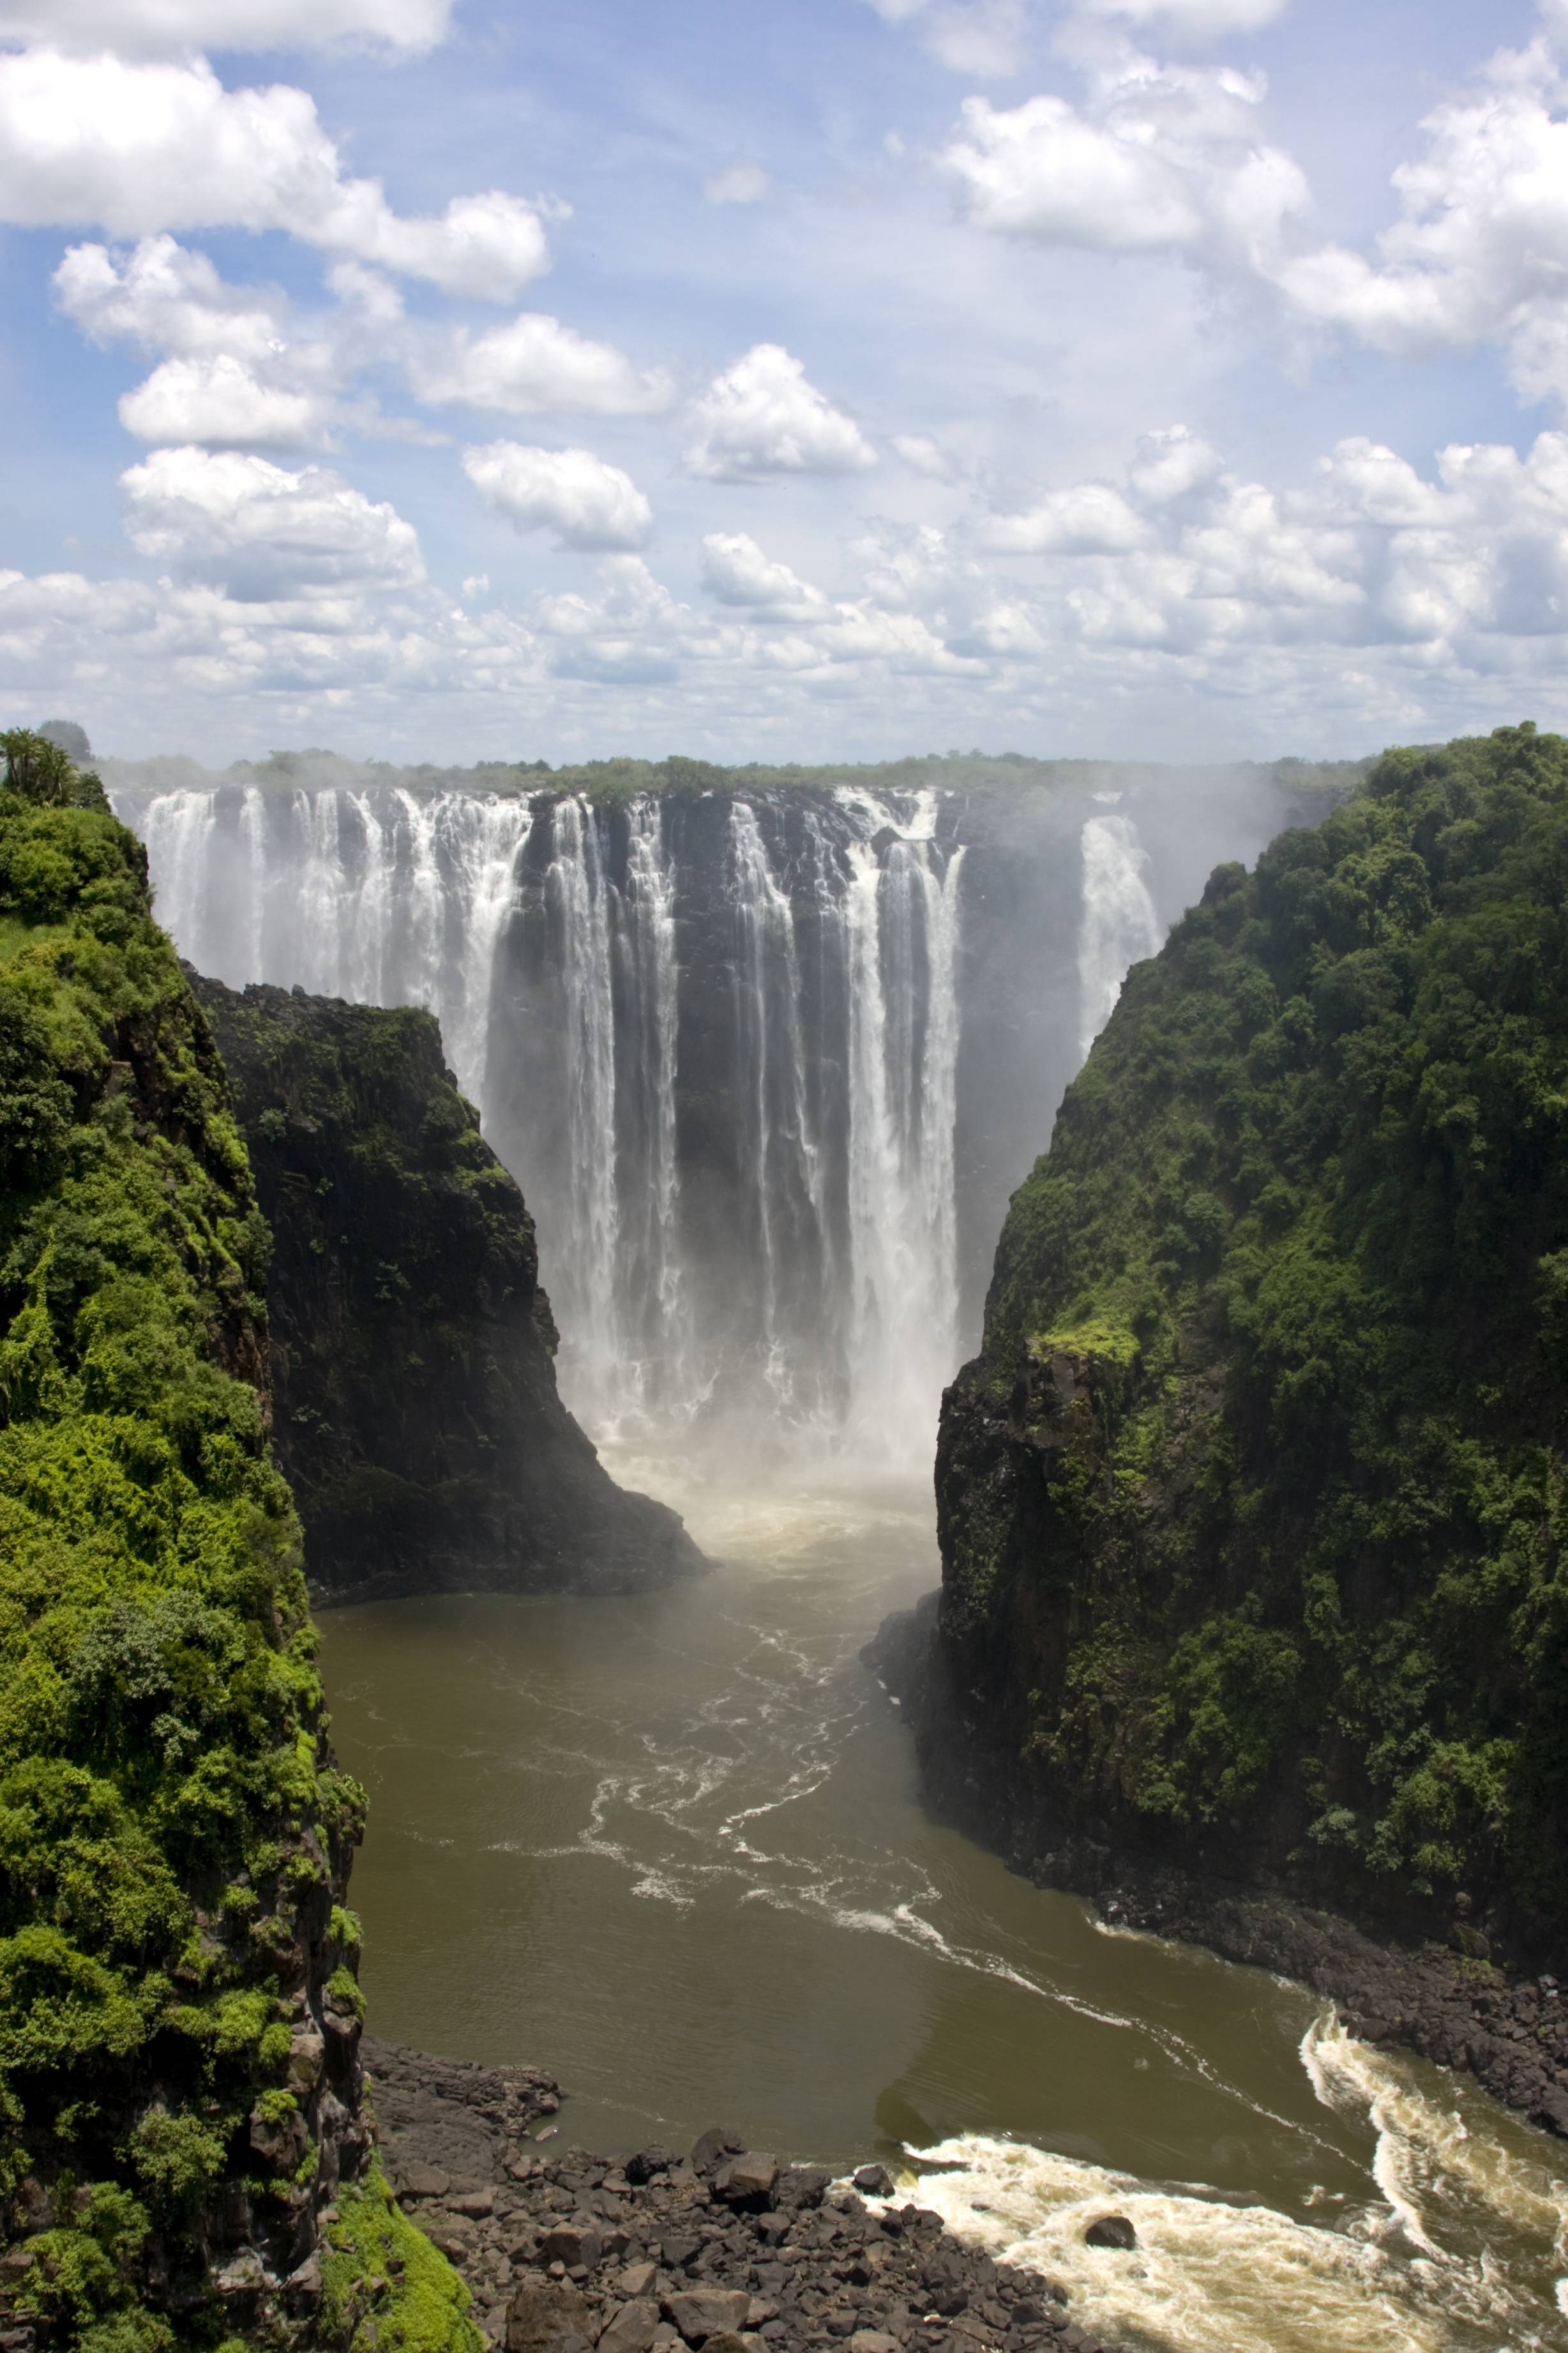 Victoria Falls Wallpaper - WallpaperSafari